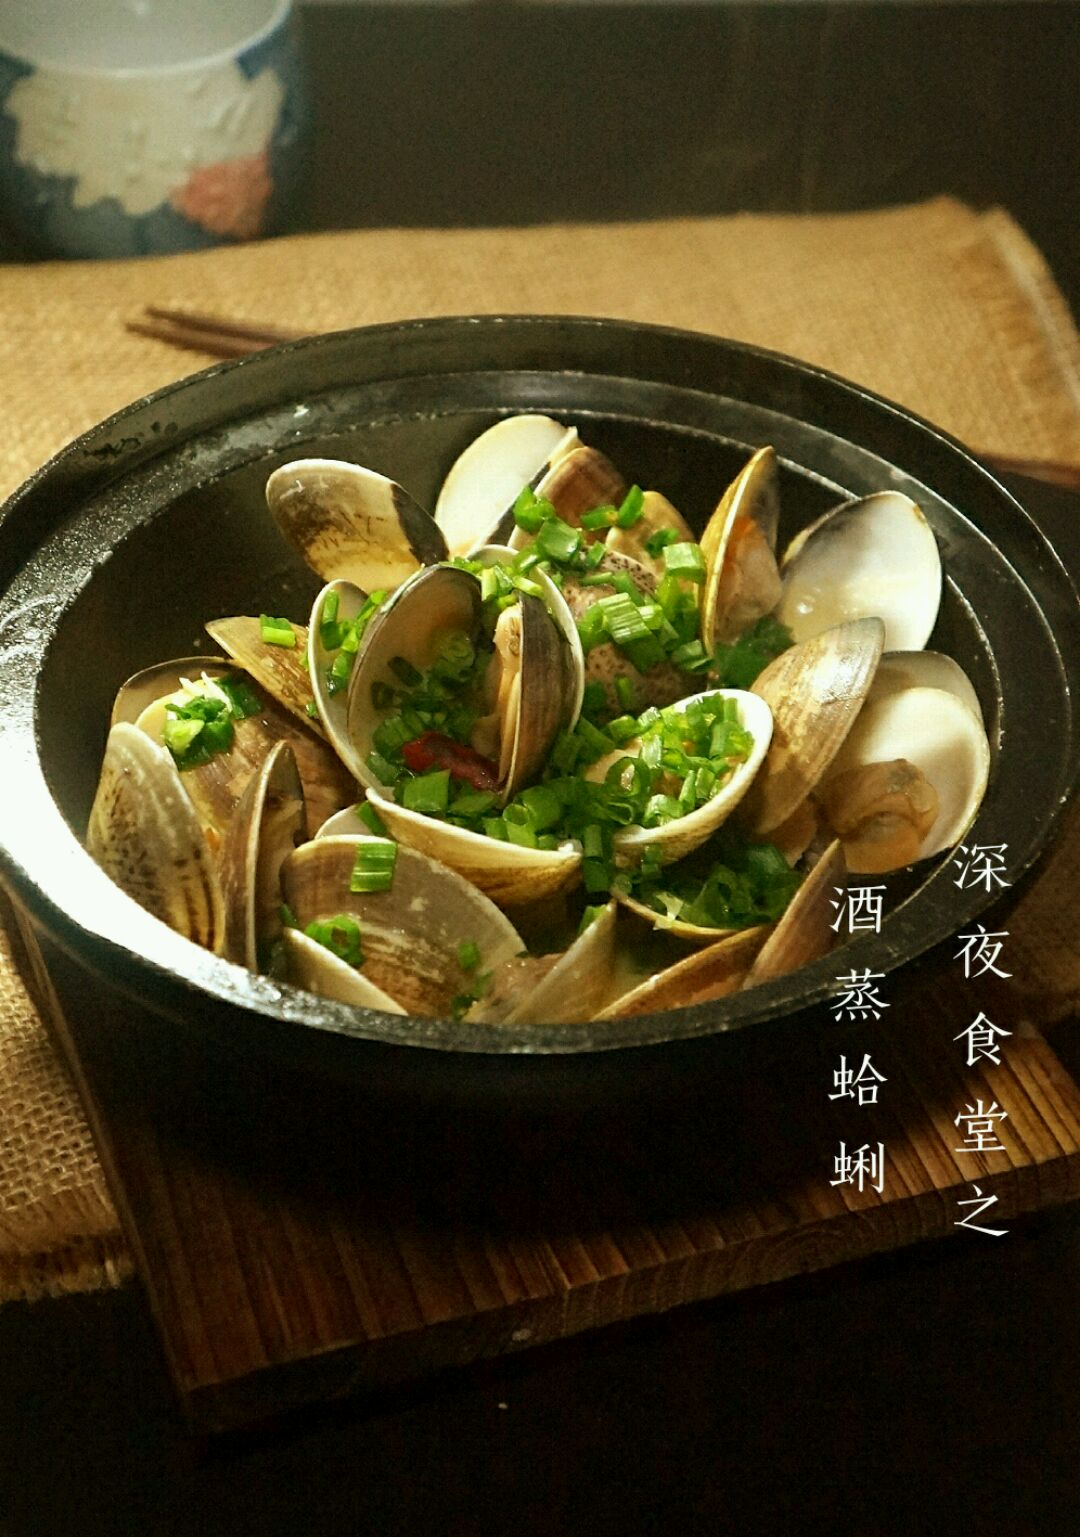 中国 版 深夜 食堂